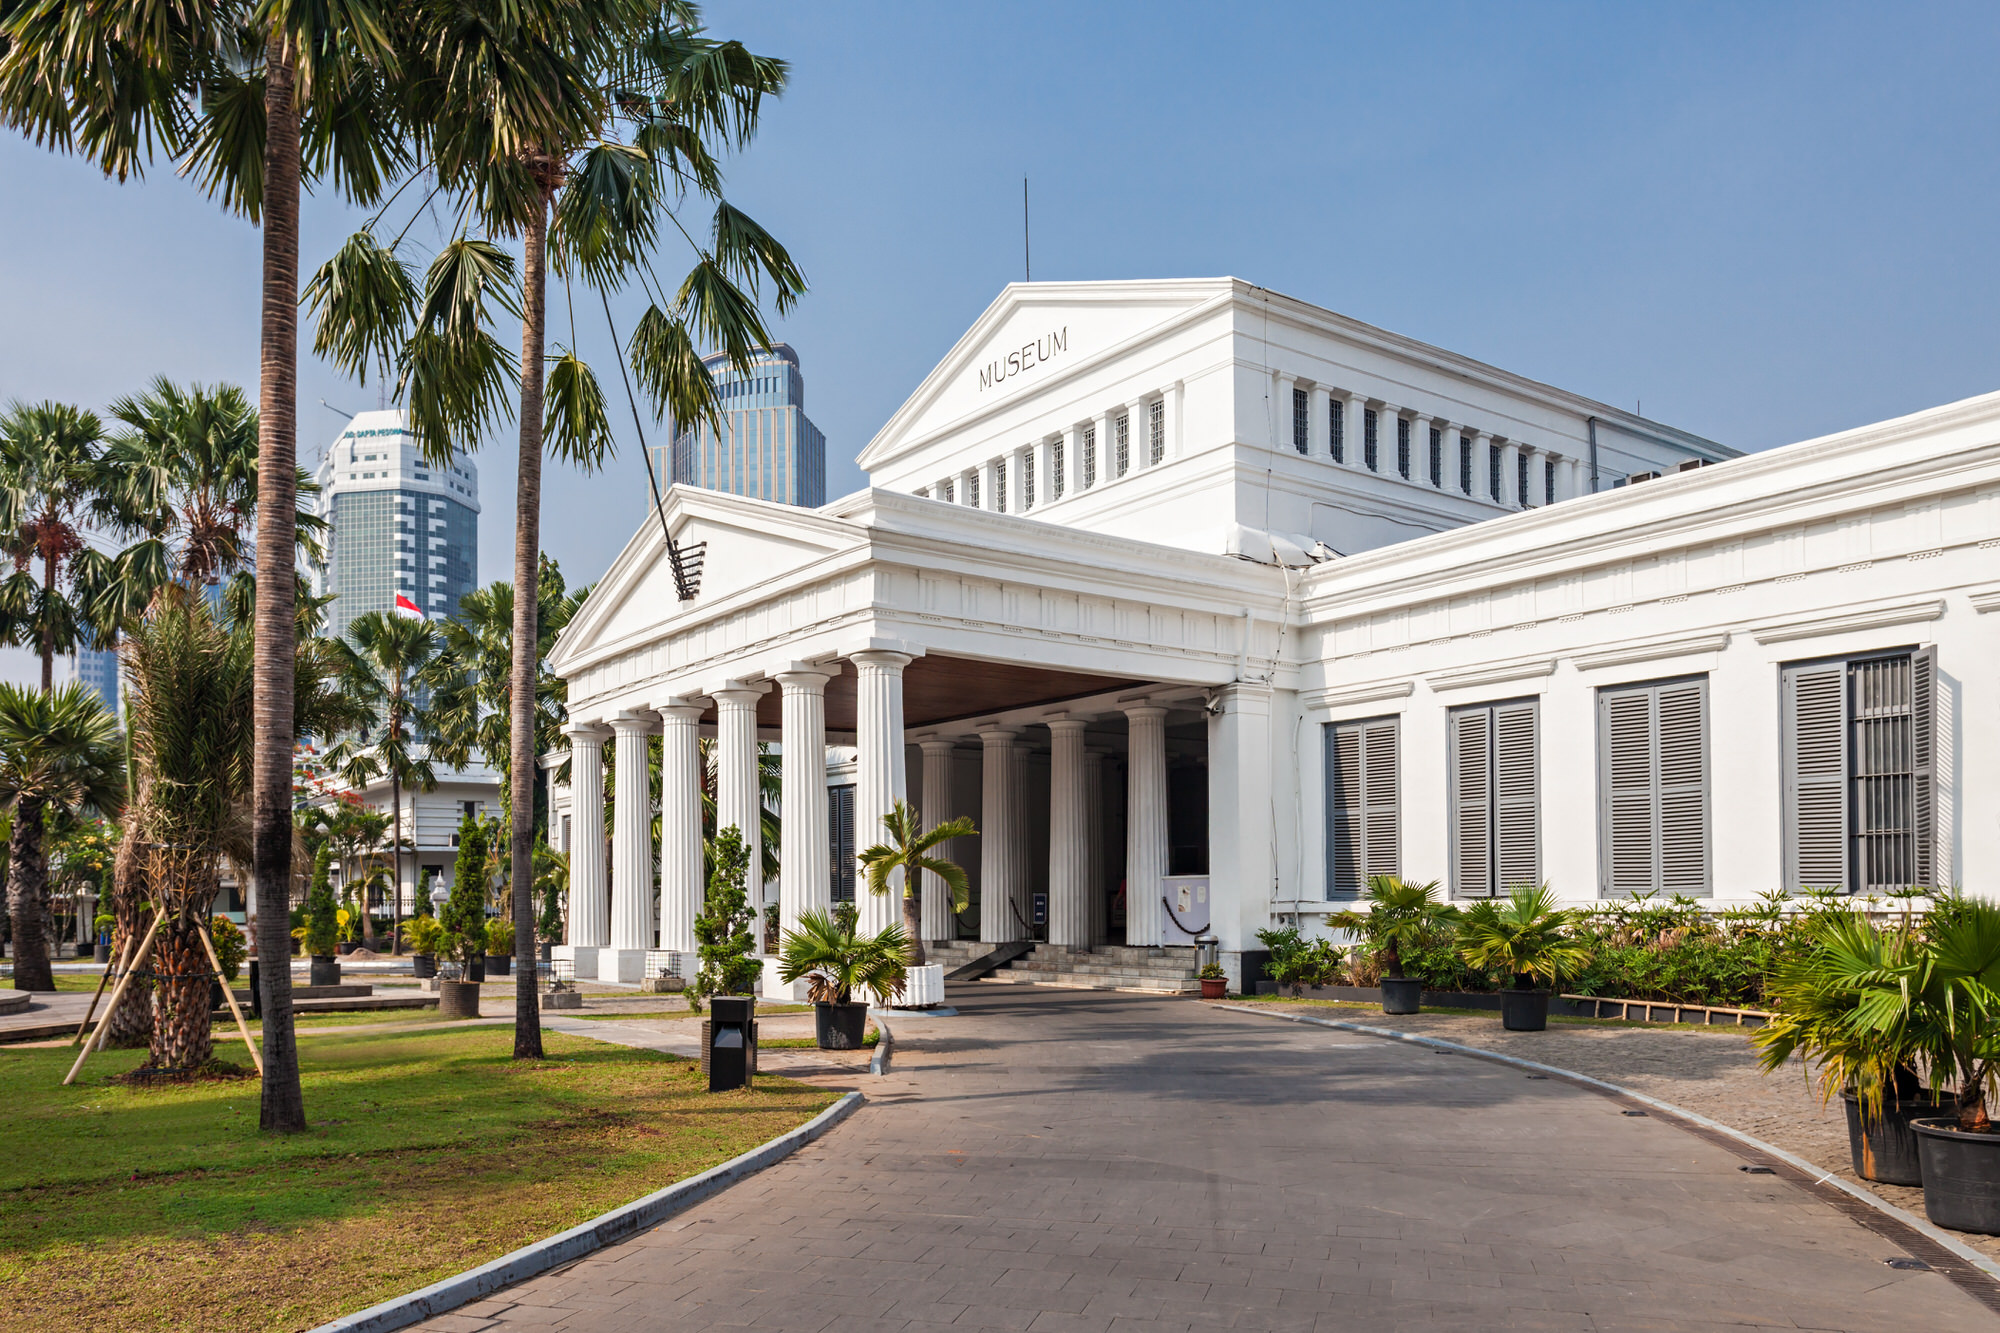 Indonesisches Nationalmuseum Gedung Gajah